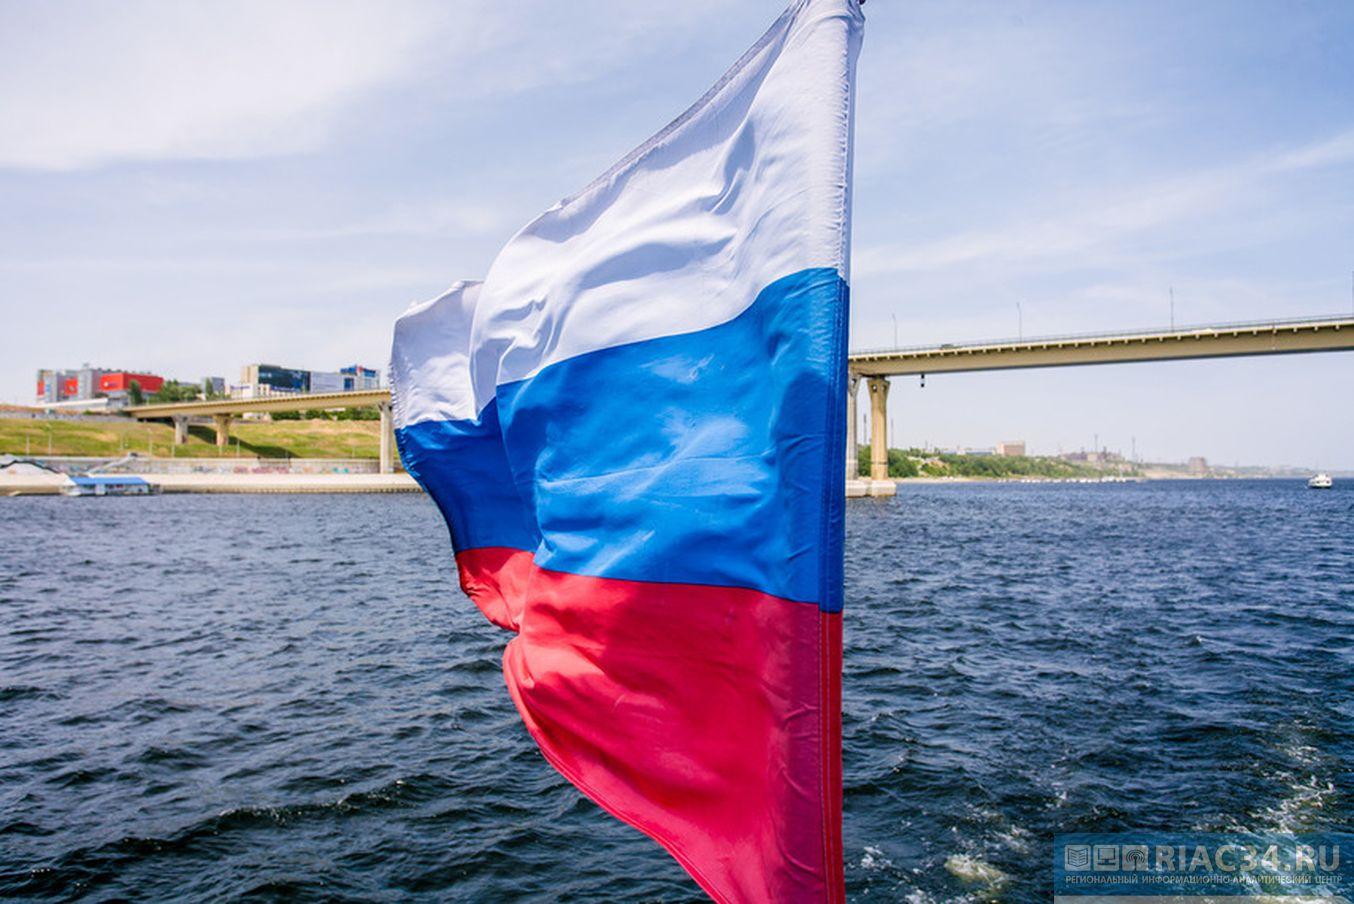 Руководитель Росавтодора оценил ремонт волгоградских дорог вовремя пробежки